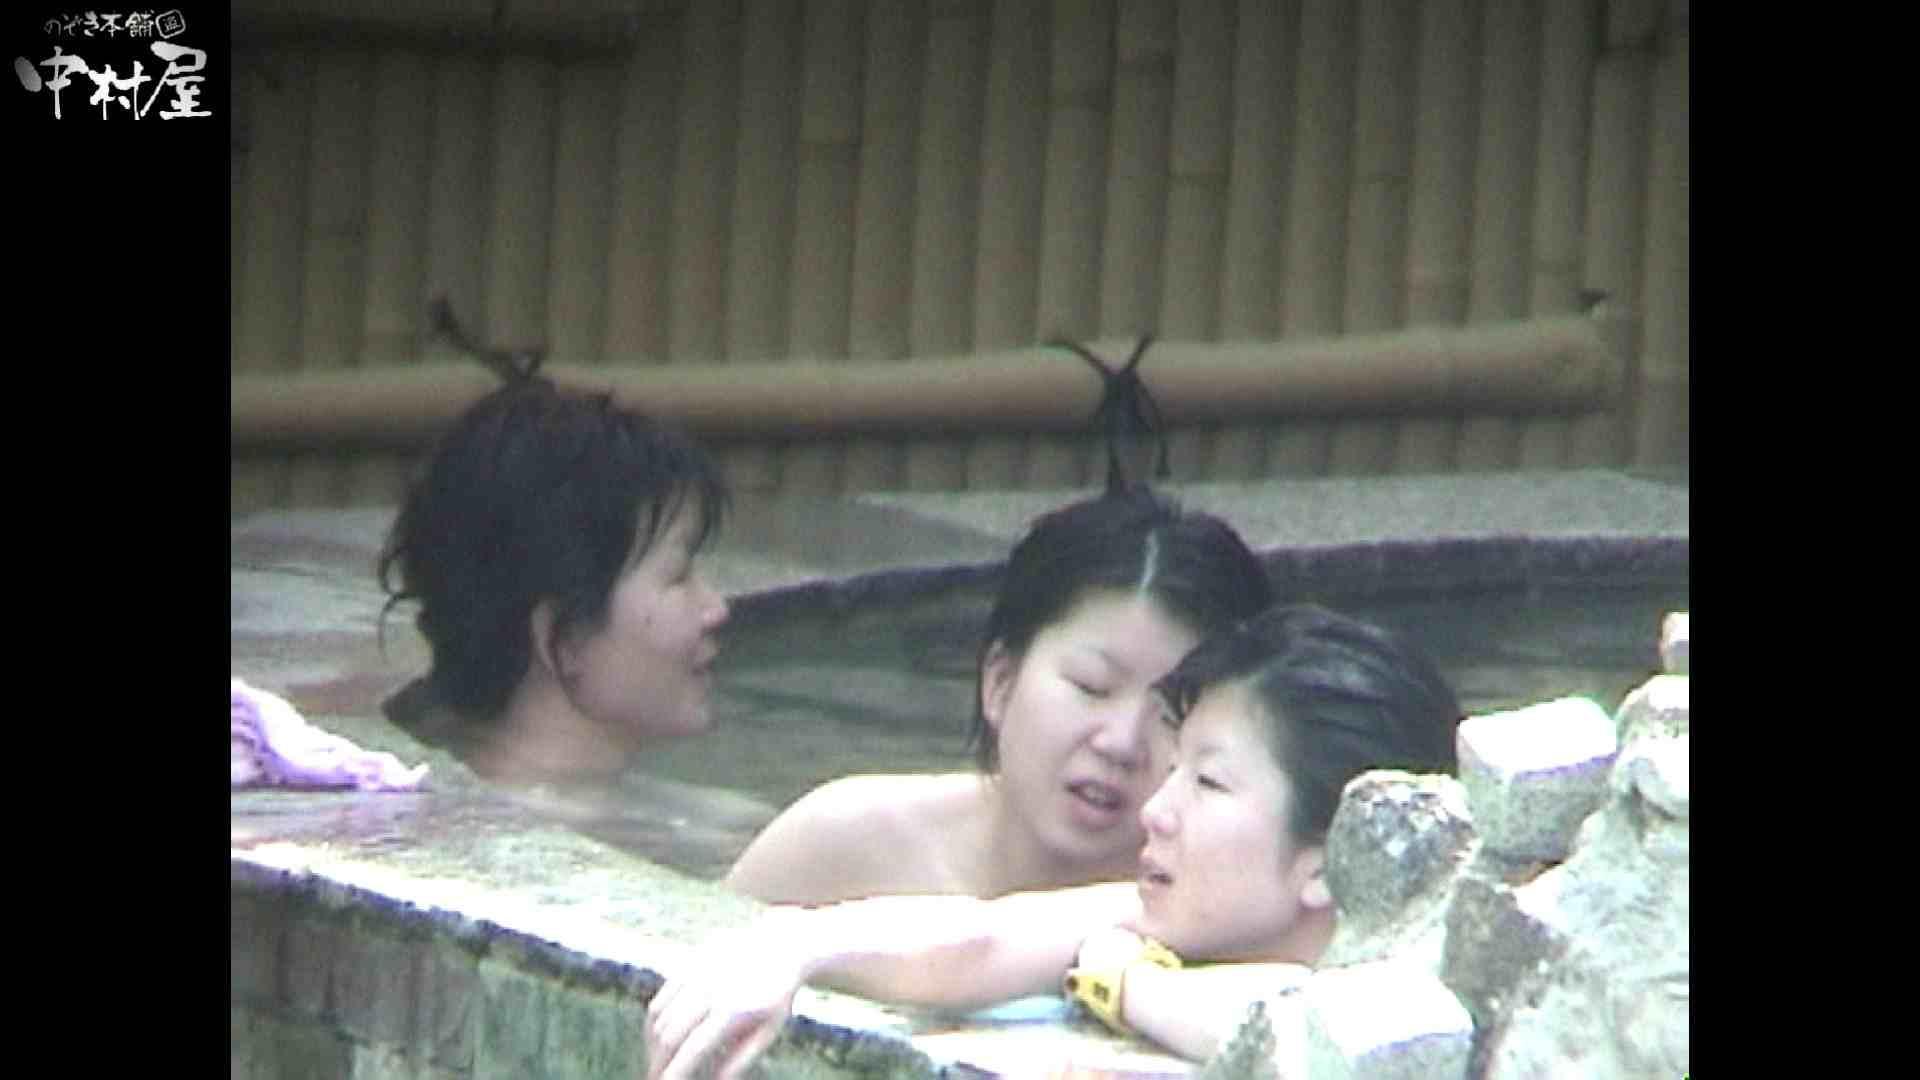 Aquaな露天風呂Vol.936 盗撮映像  110Pix 66